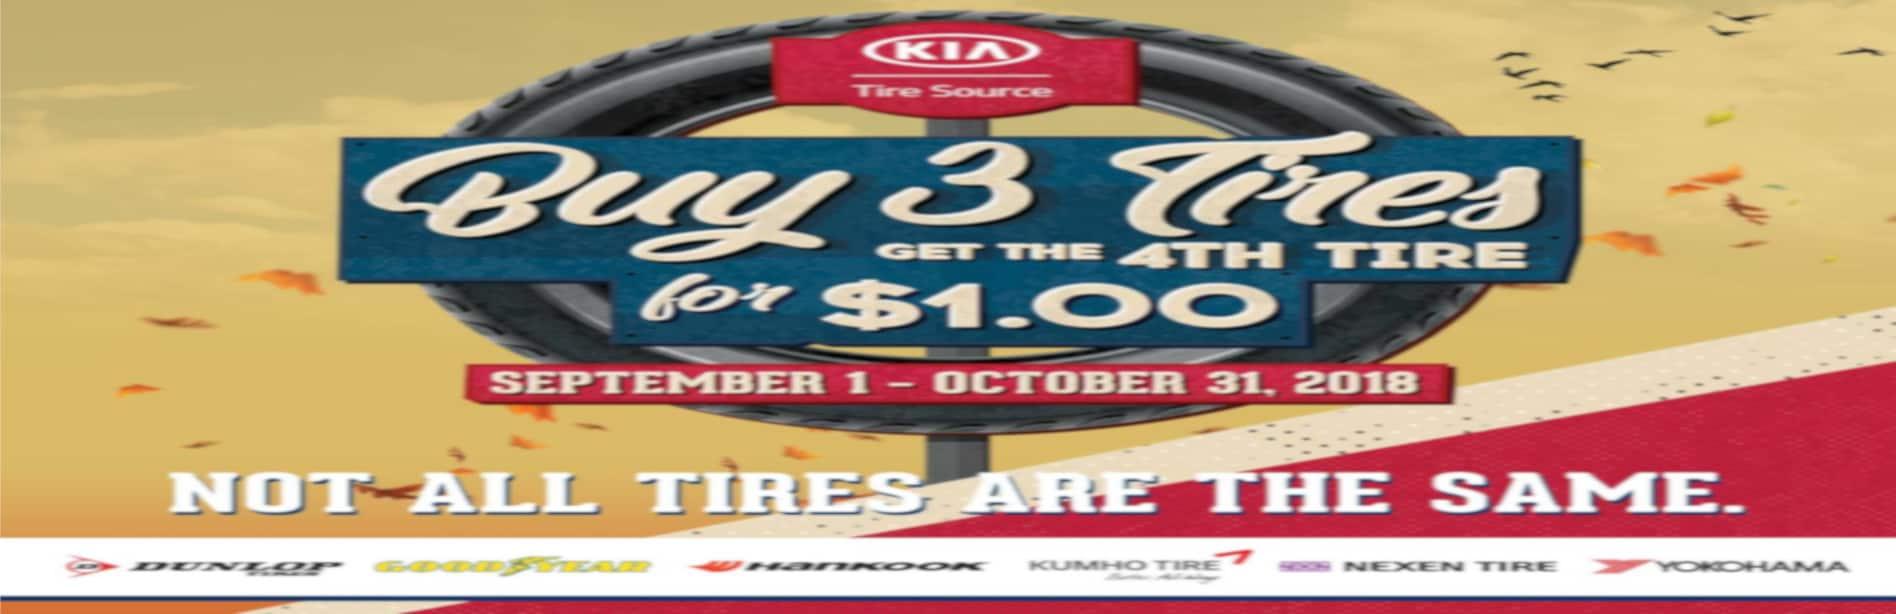 Pye Kia | New Kia Dealership In Dalton, GA 30721